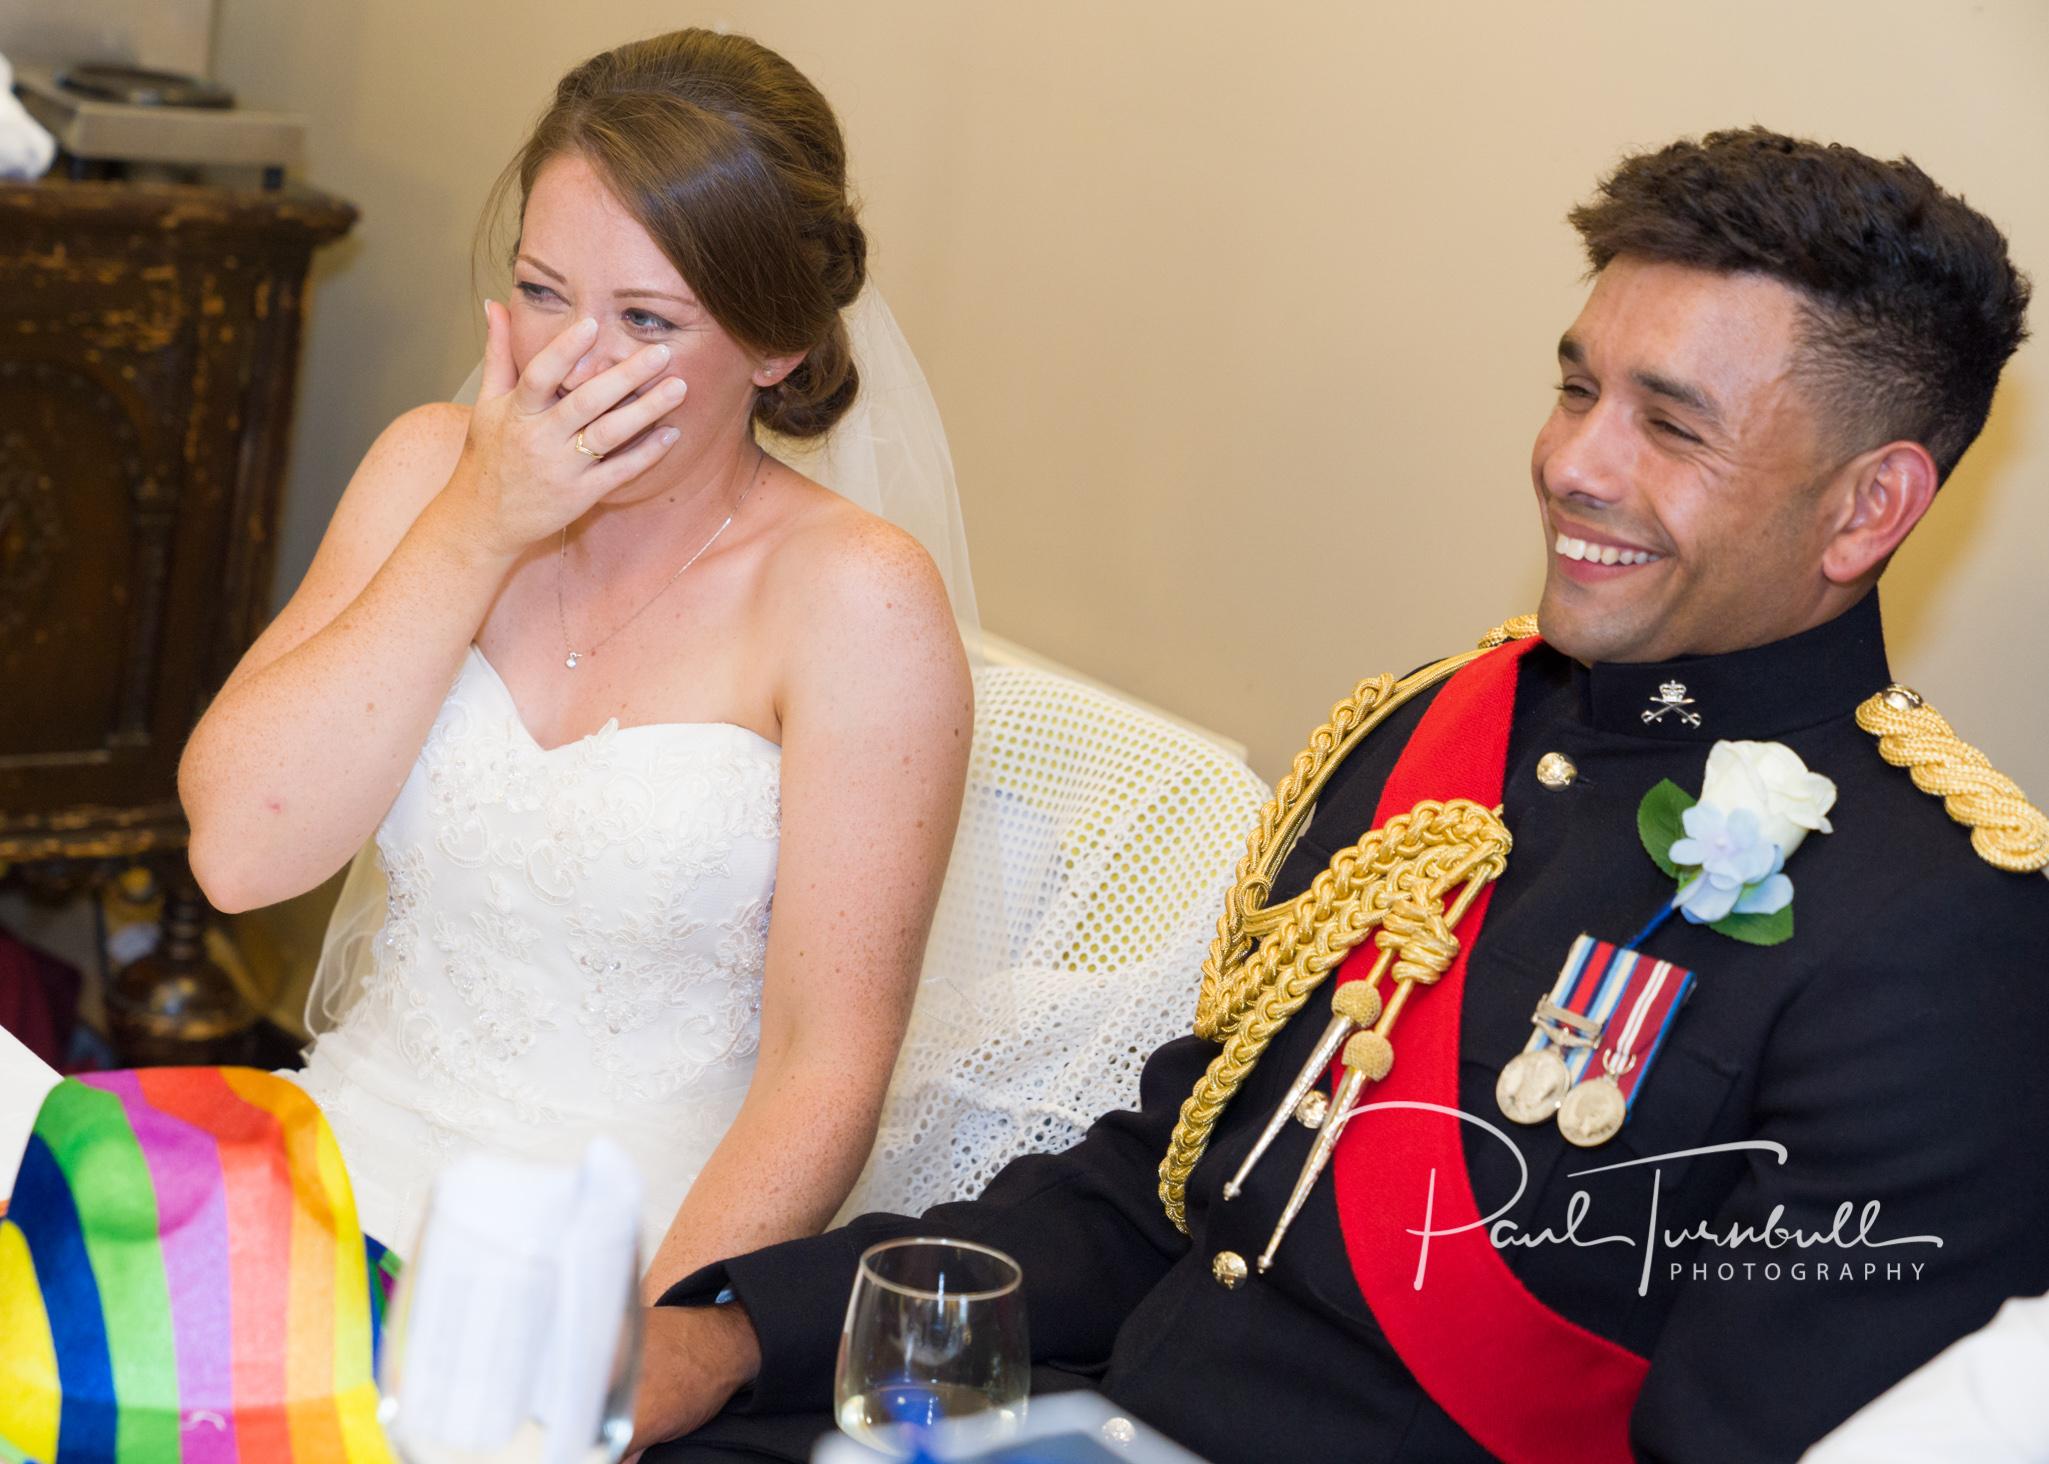 wedding-photographer-south-dalton-walkington-yorkshire-emma-james-067.jpg